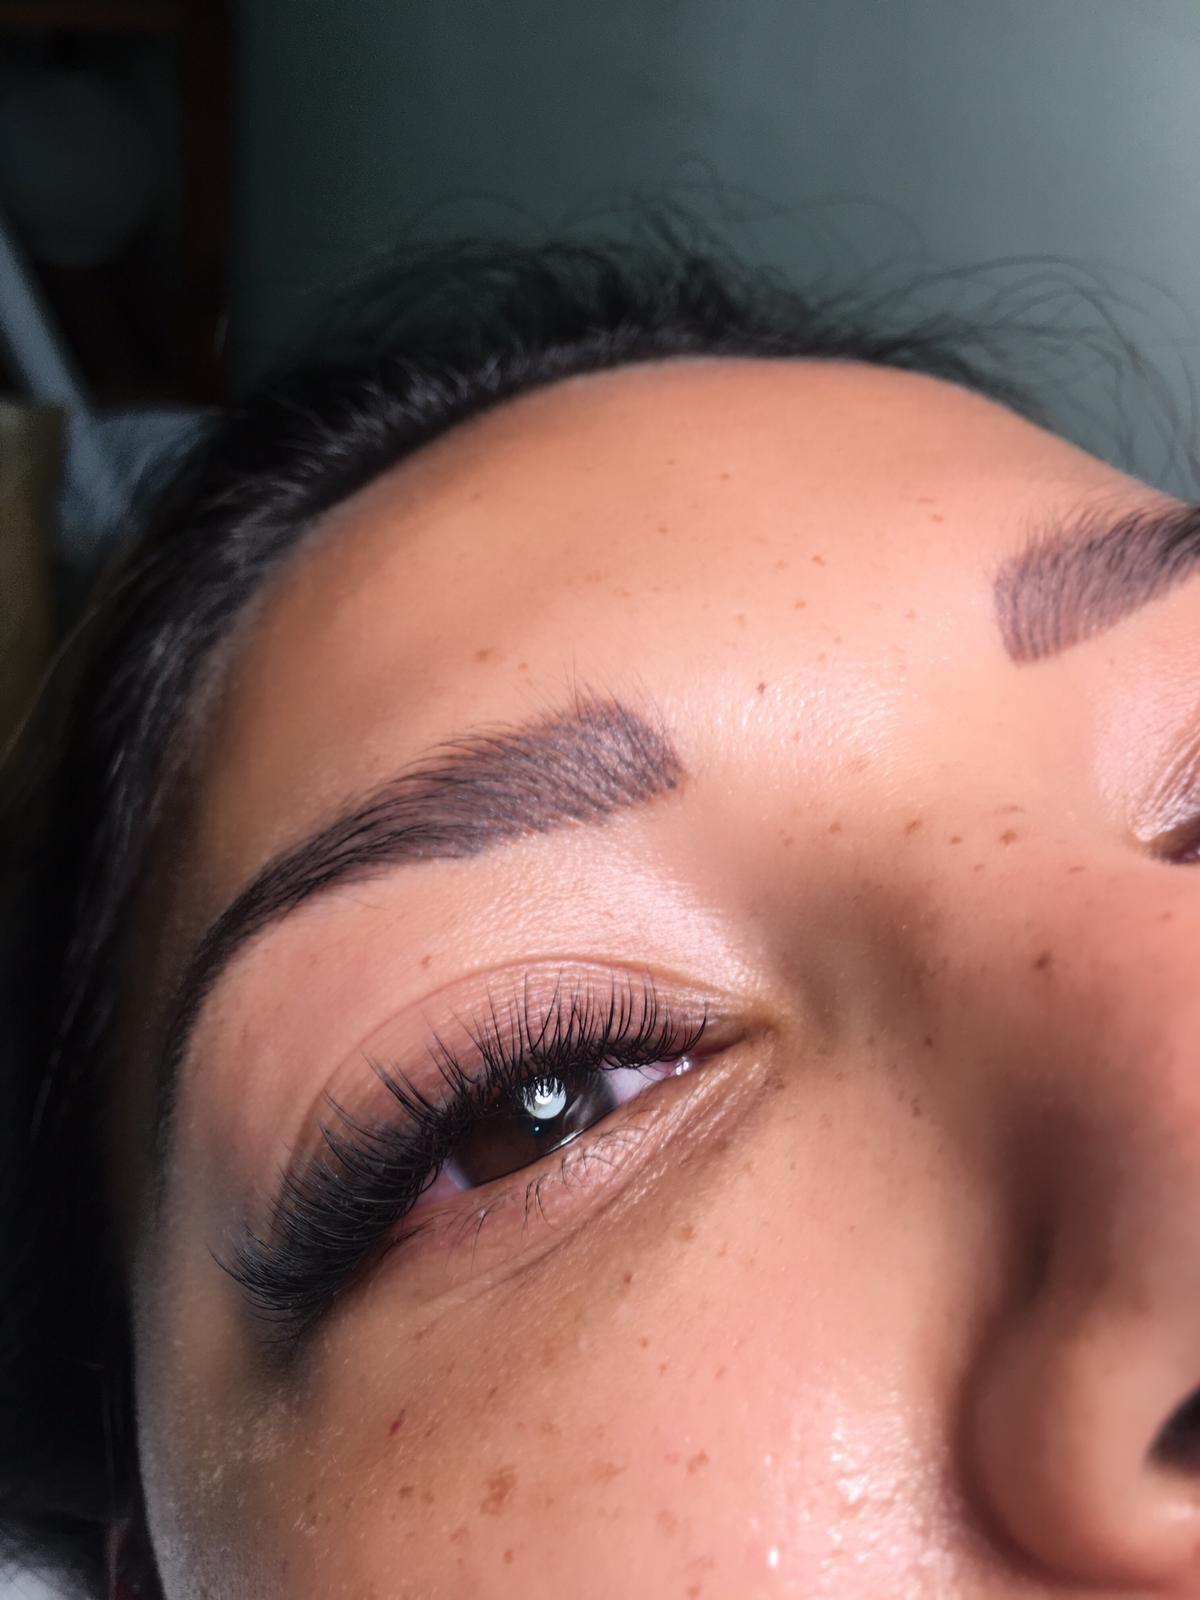 Extensiones de pestañas pelo a pelo para una mirada espectacular